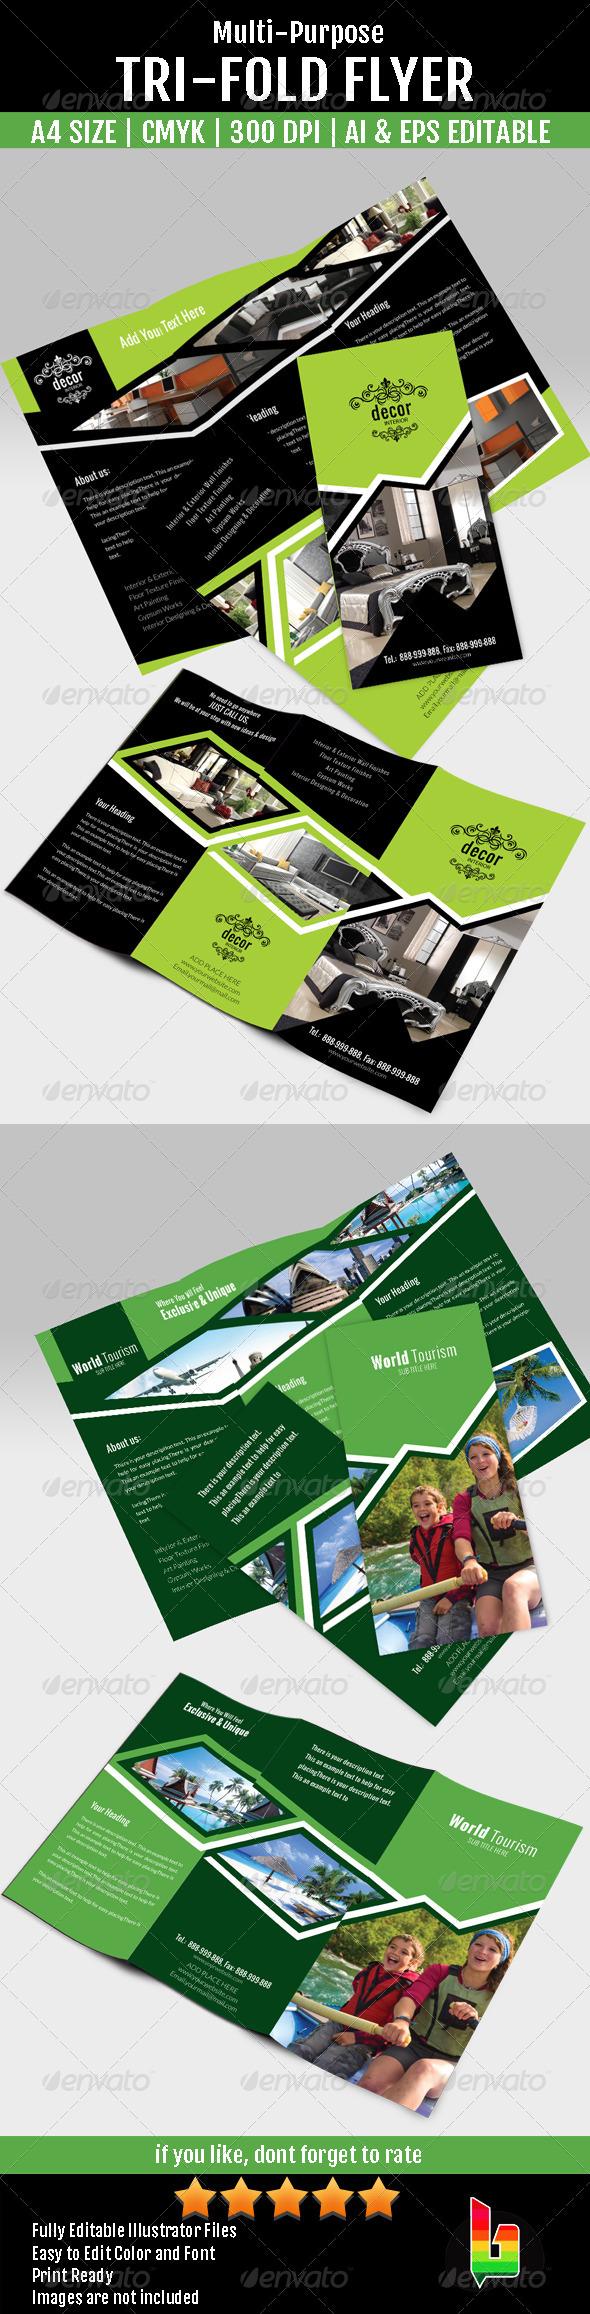 Multi-Purpose Tri Fold Flyer - Corporate Flyers